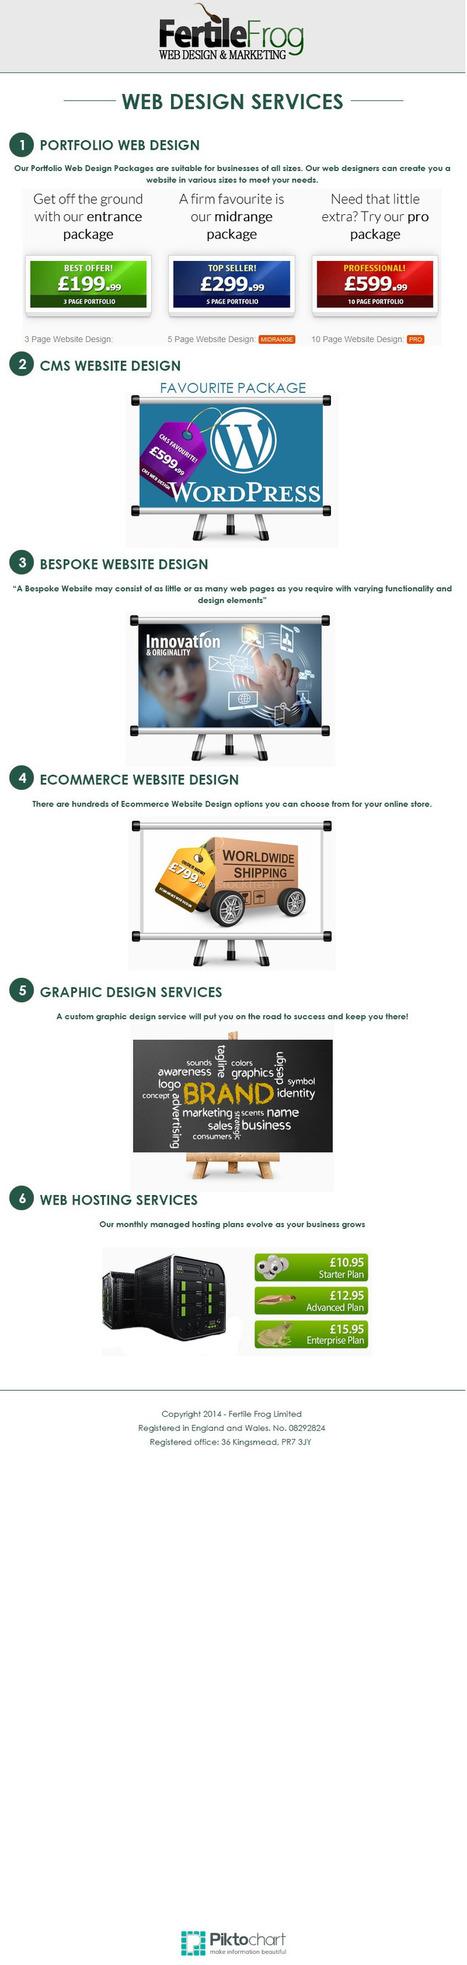 FertileFrog | Web Design and SEO | Scoop.it